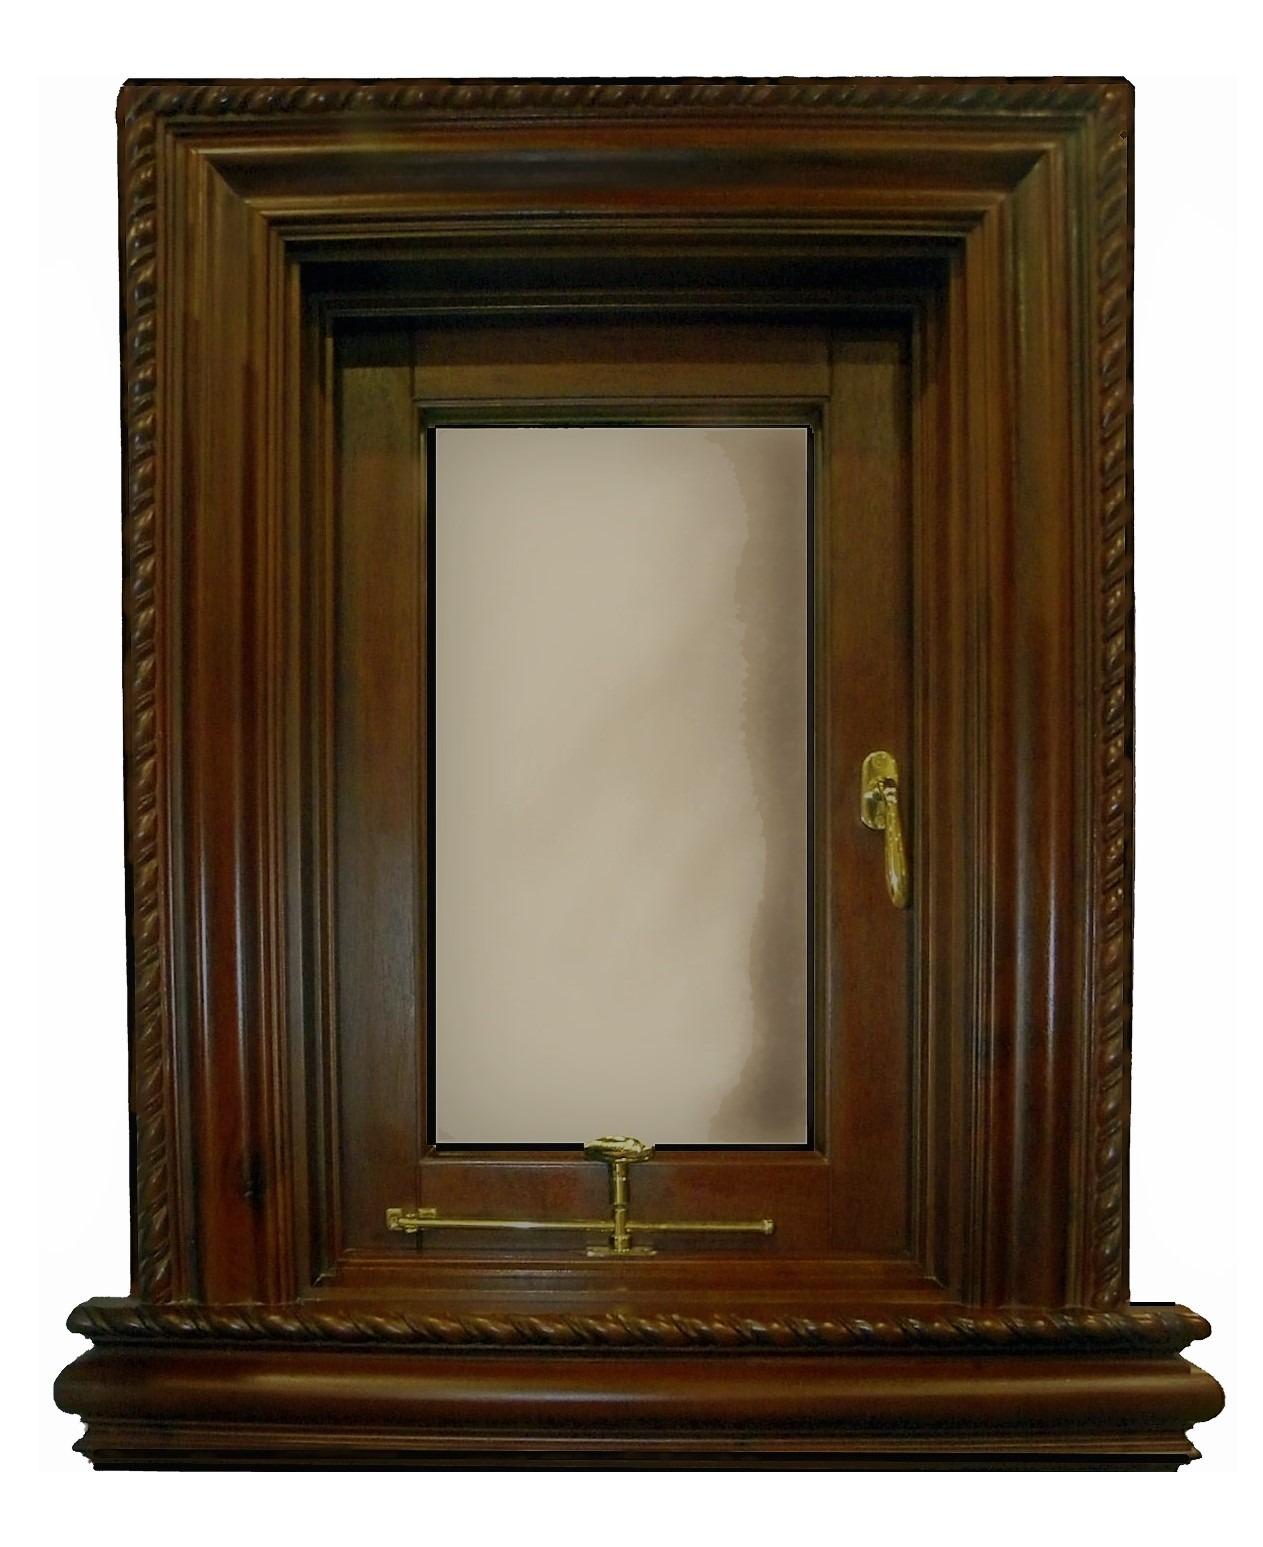 BOTICELLI MAHOGANY SINGLE SASH CASEMENT WINDOW